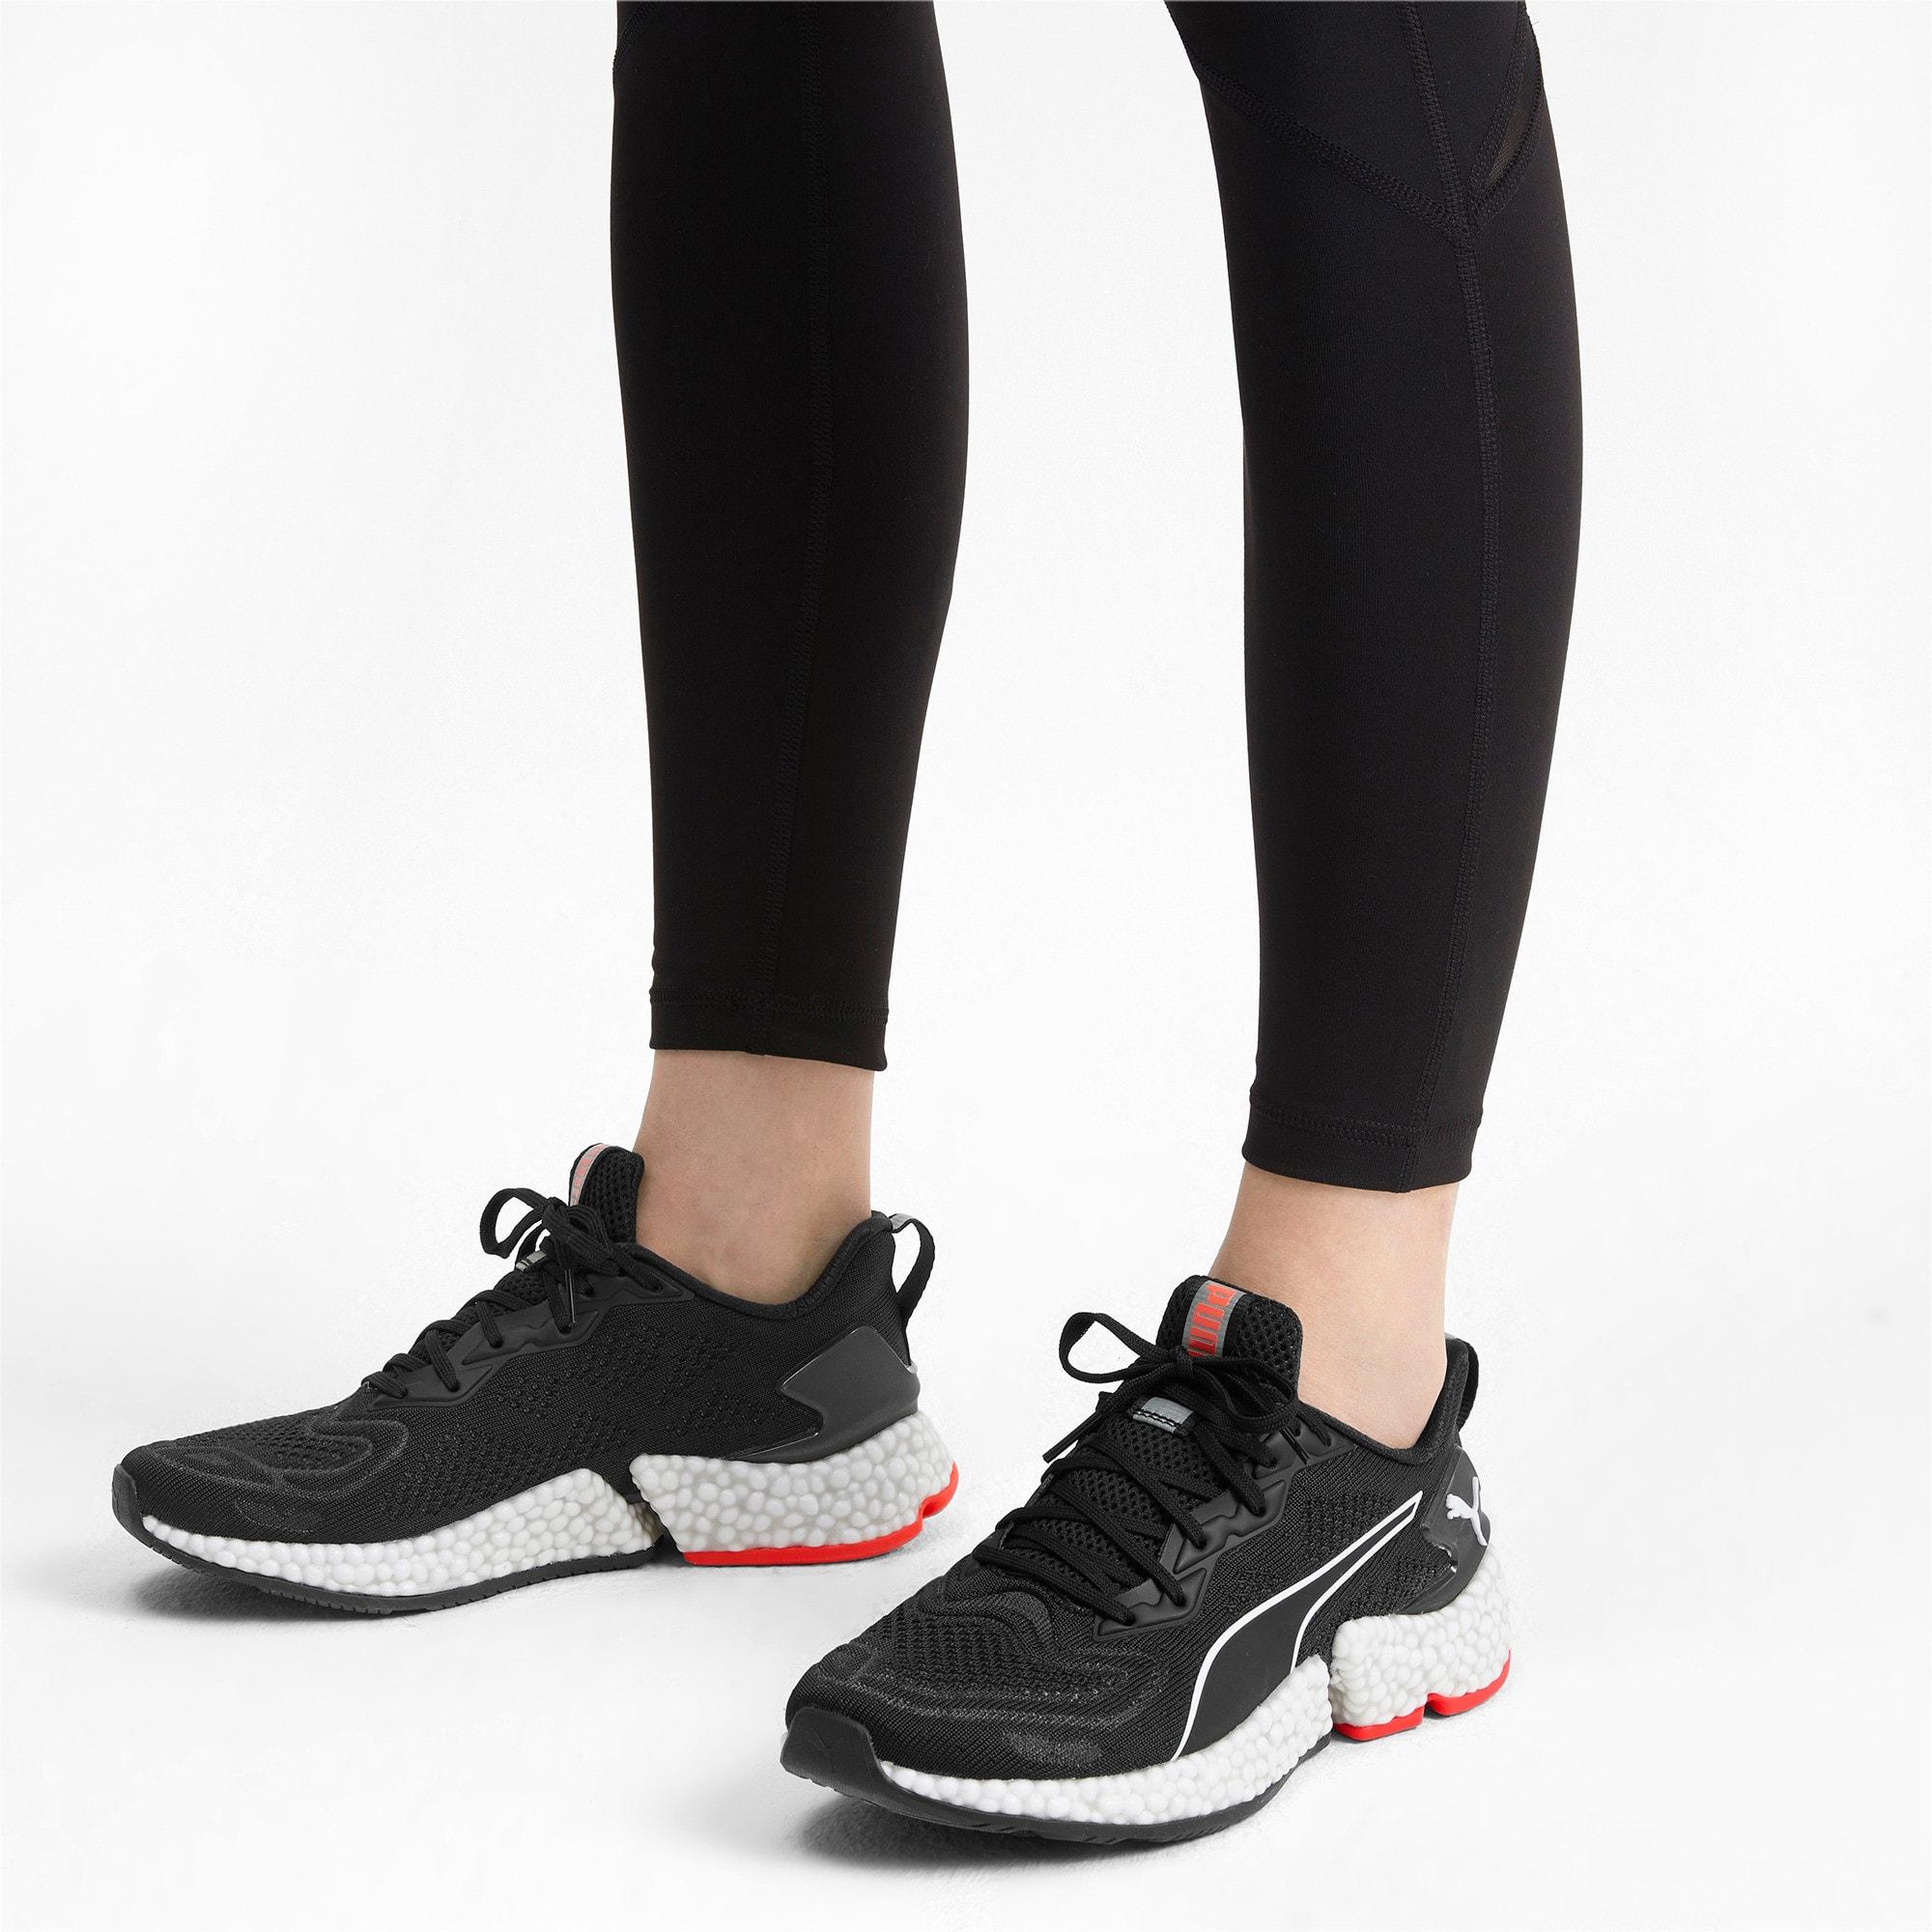 Miniatura 2 de Zapatos para correr SPEED Orbiter para mujer, Black-Red-Milky Blue-White, mediano